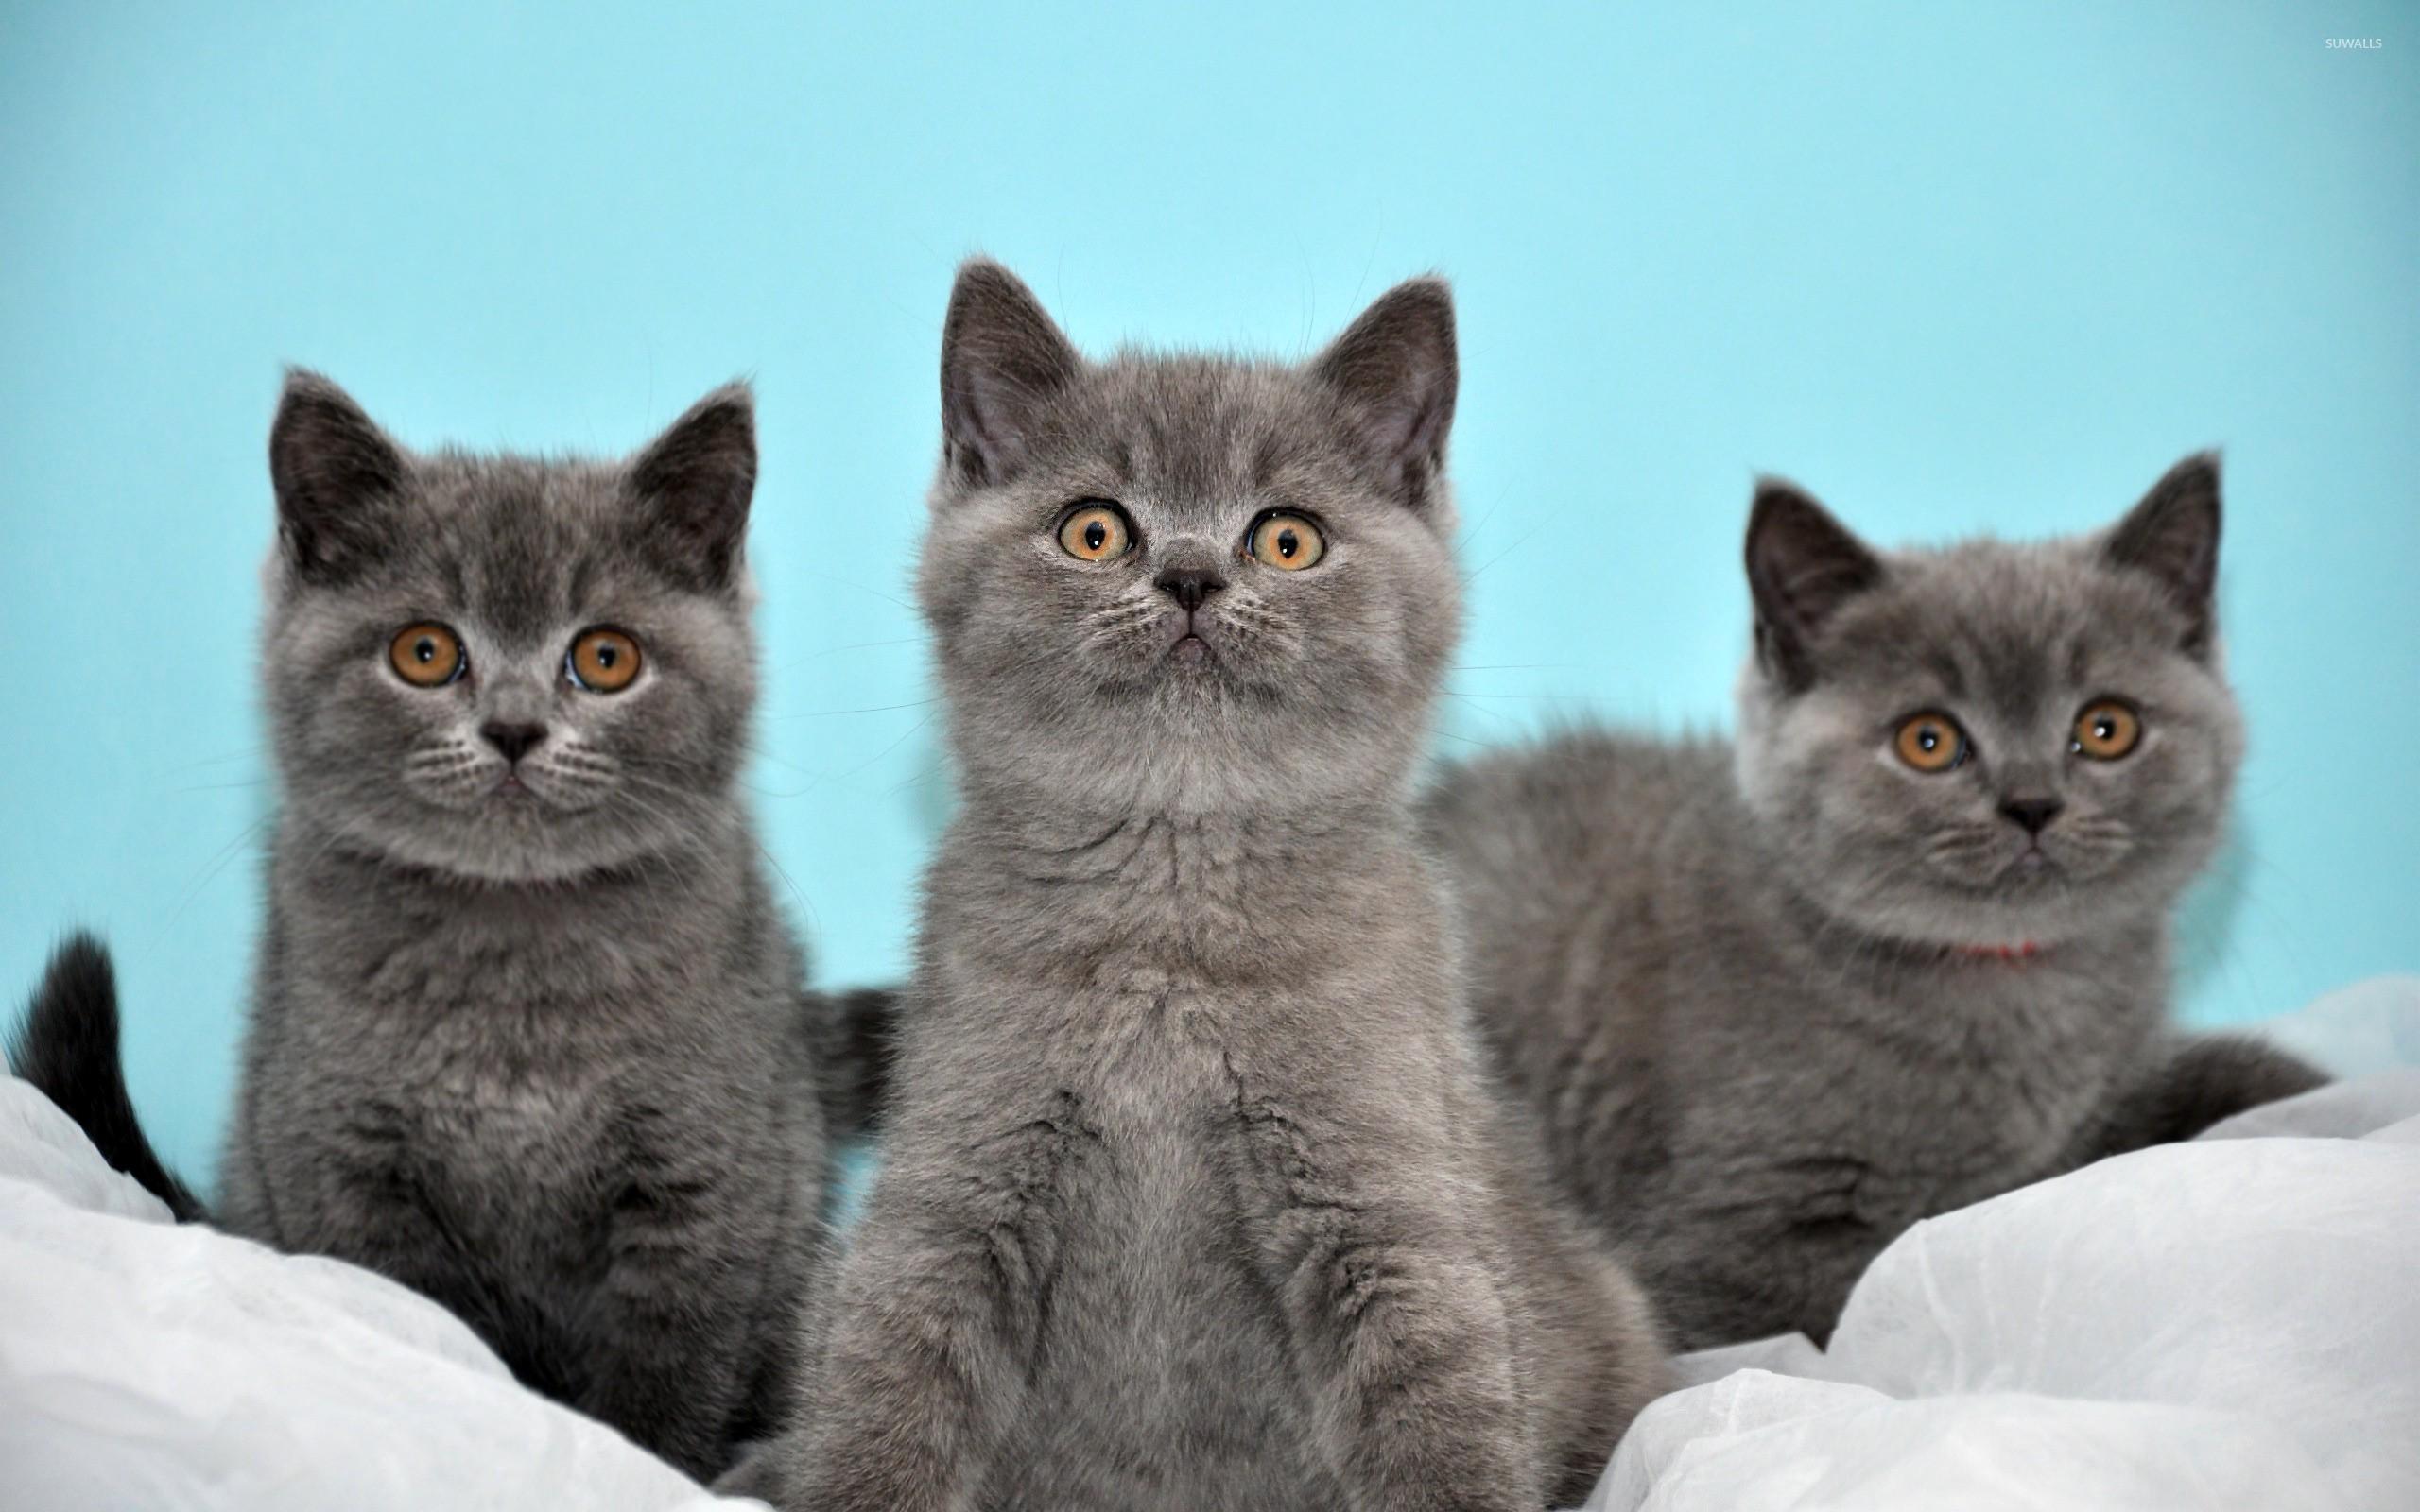 Cute Kitten Wallpaper For Ipad Kittens Wallpaper 183 ① Download Free Stunning Full Hd